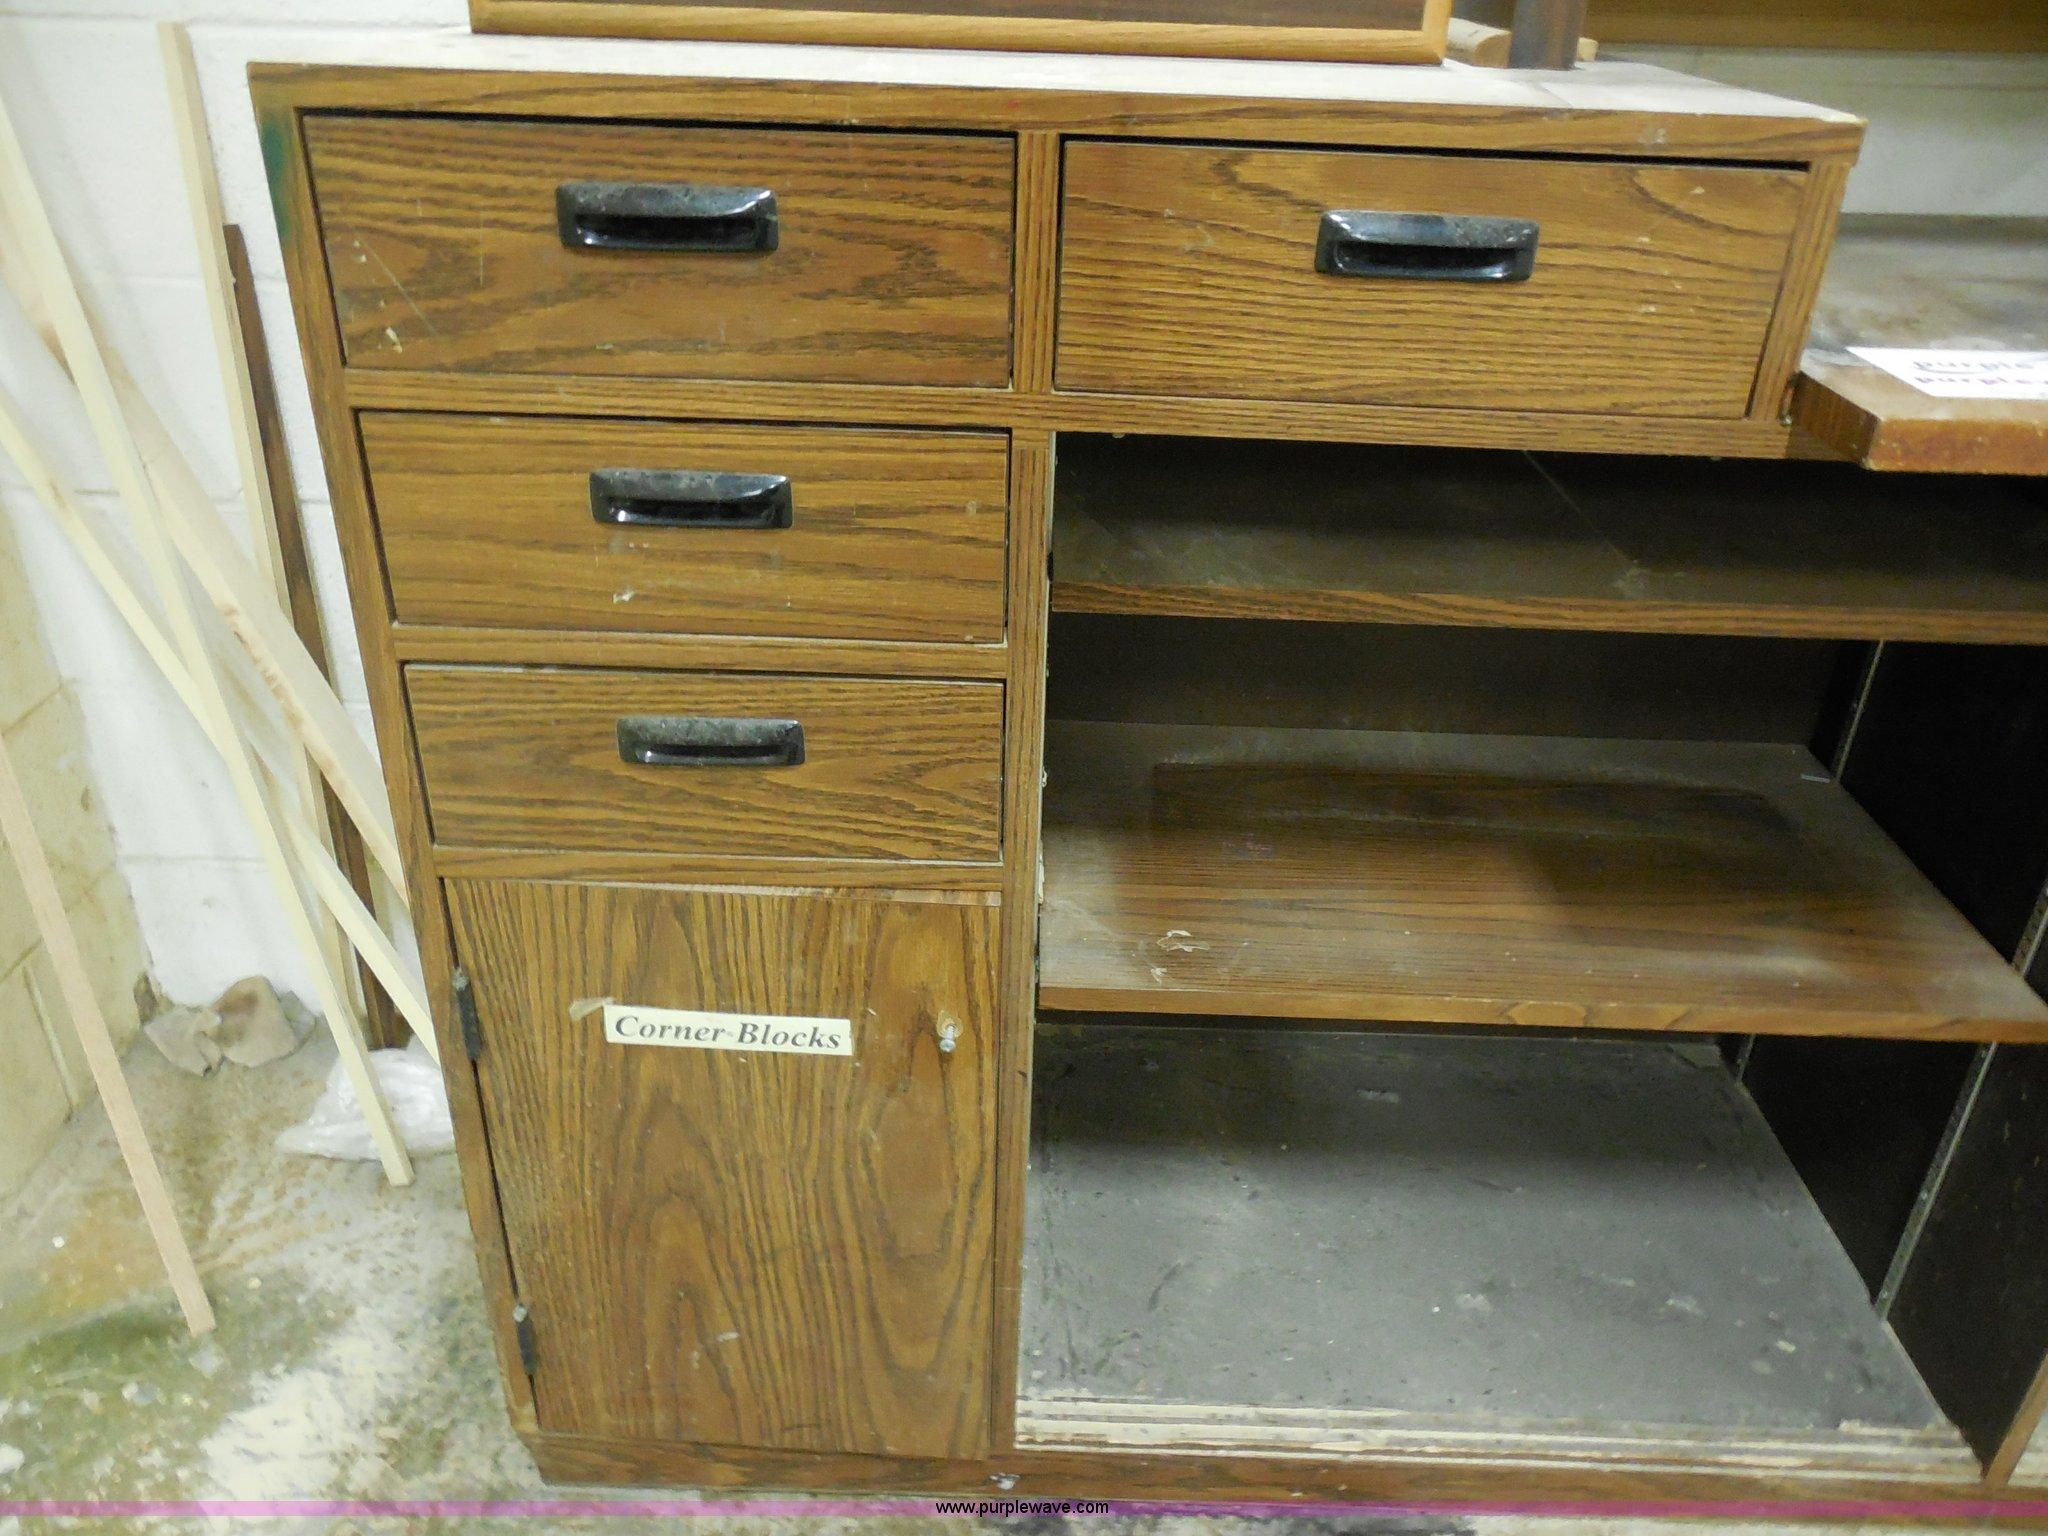 Marvelous Work Bench Item A5106 Sold April 17 Midwest Auction P Beatyapartments Chair Design Images Beatyapartmentscom